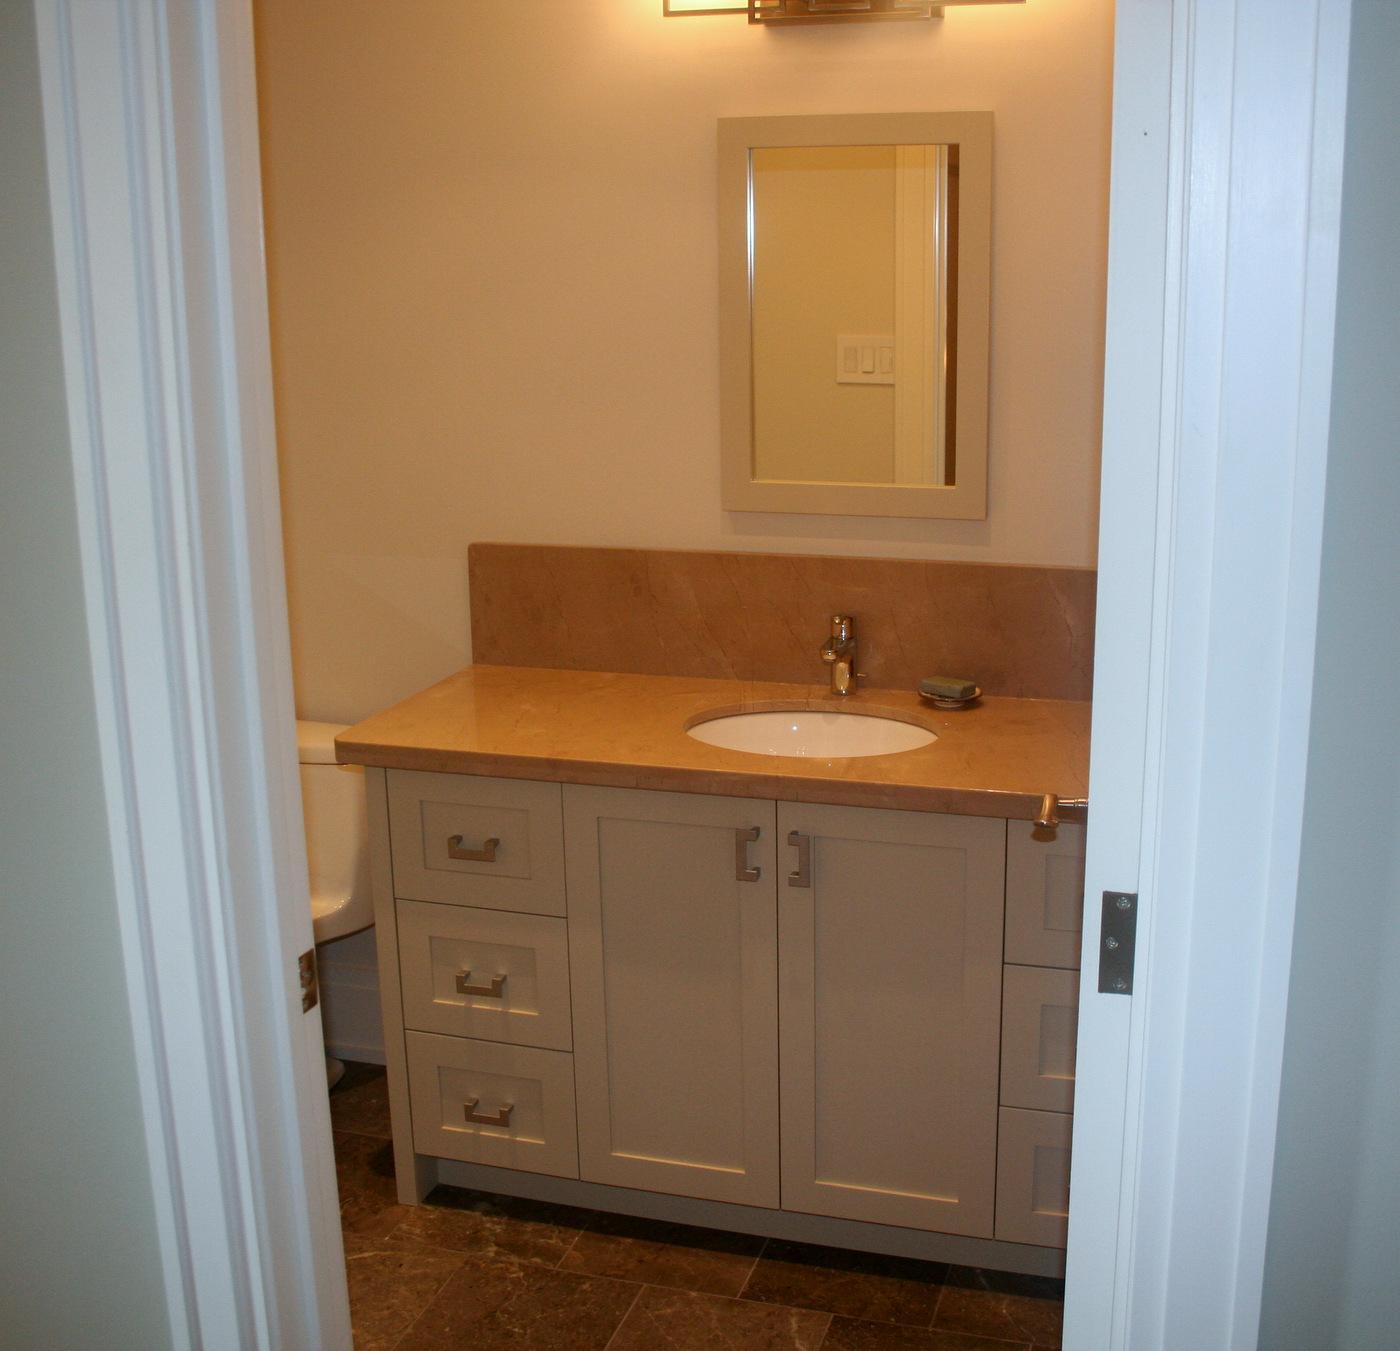 Modern bathroom martin c vendryes for Martin craig bathroom design studio